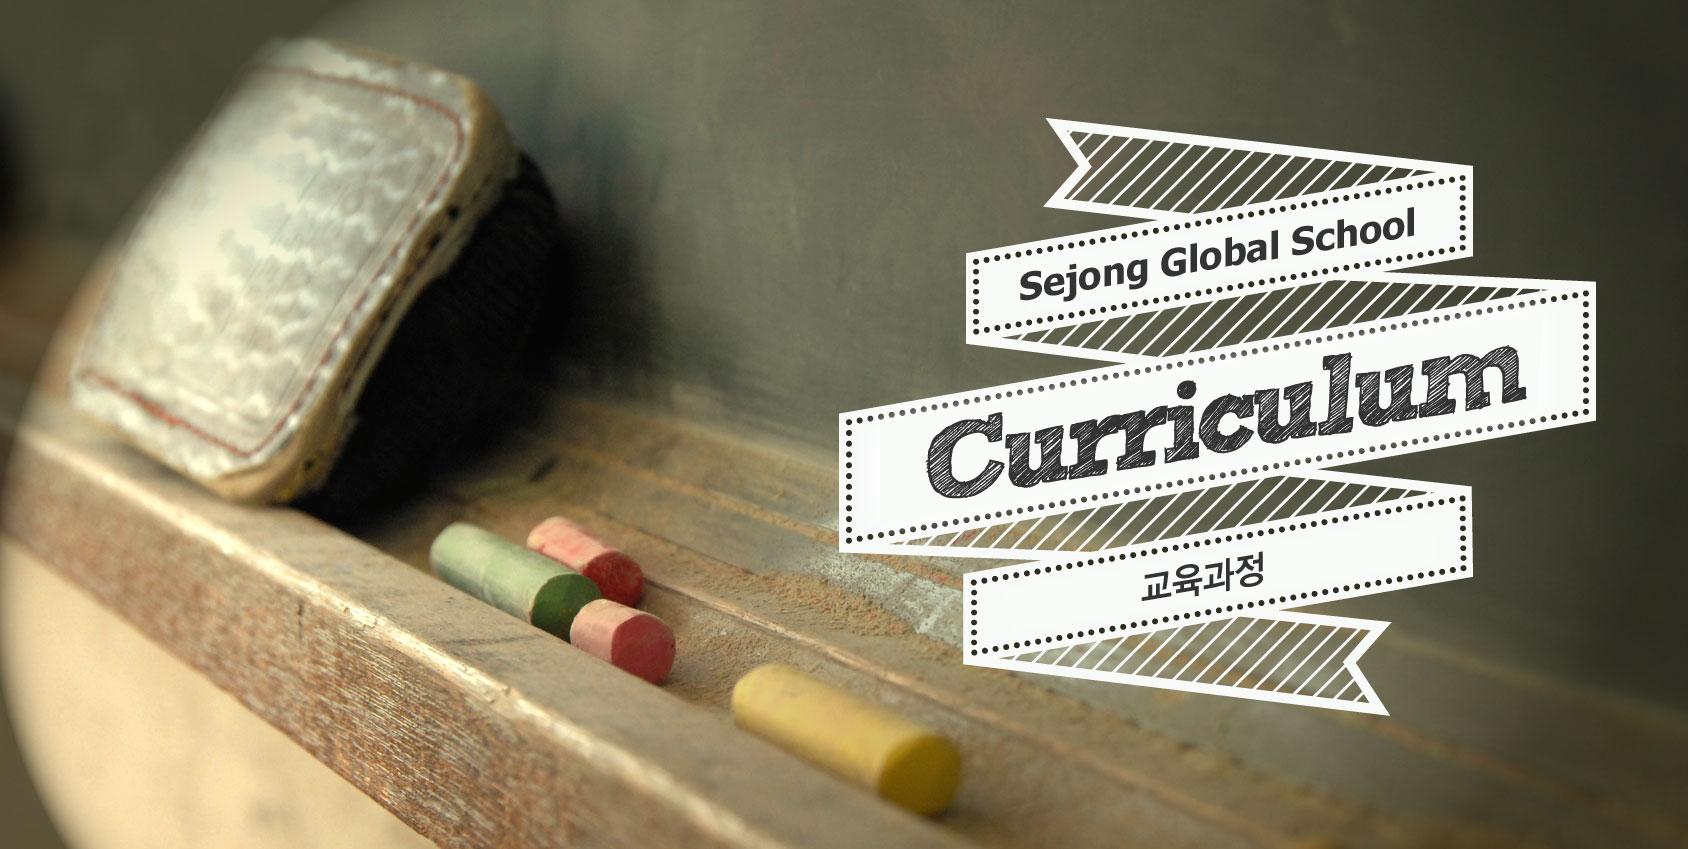 sejong_curriculum